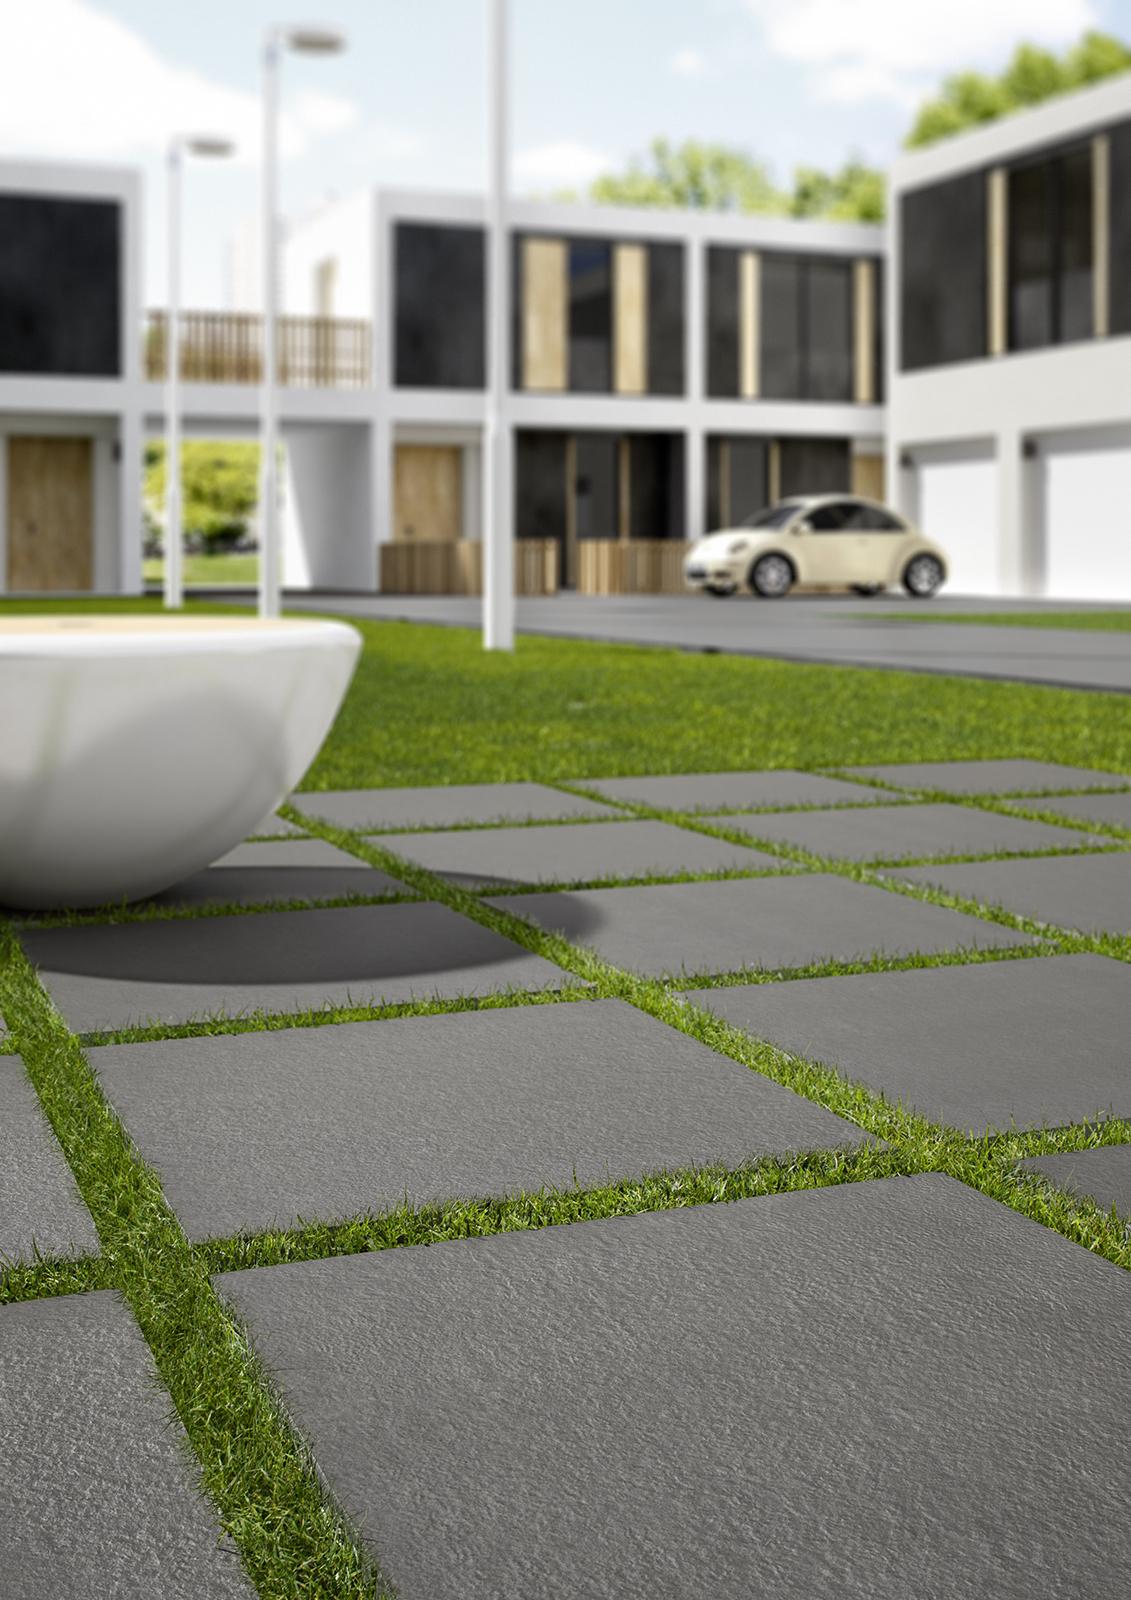 Sistemn20 outdoor flooring marazzi sistemn20 ceramic tiles marazzi5634 doublecrazyfo Choice Image